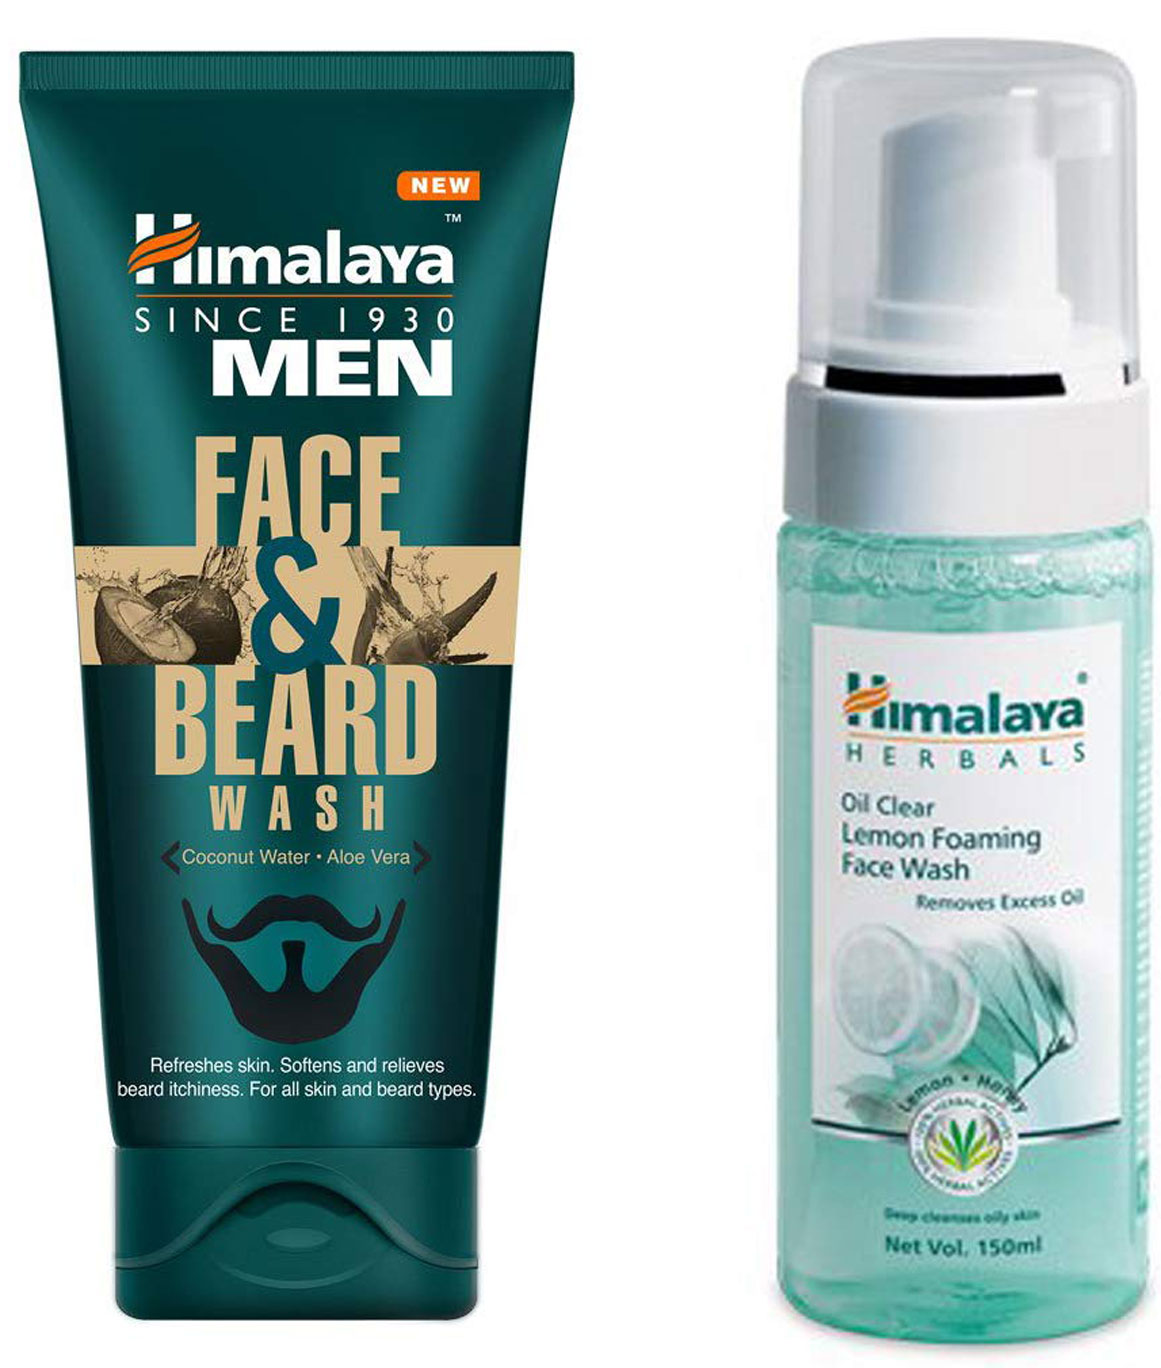 Himalaya Men Face And Beard Wash 80ml and Himalaya Herbals Oil Clear Lemon Foaming Face Wash 150ml